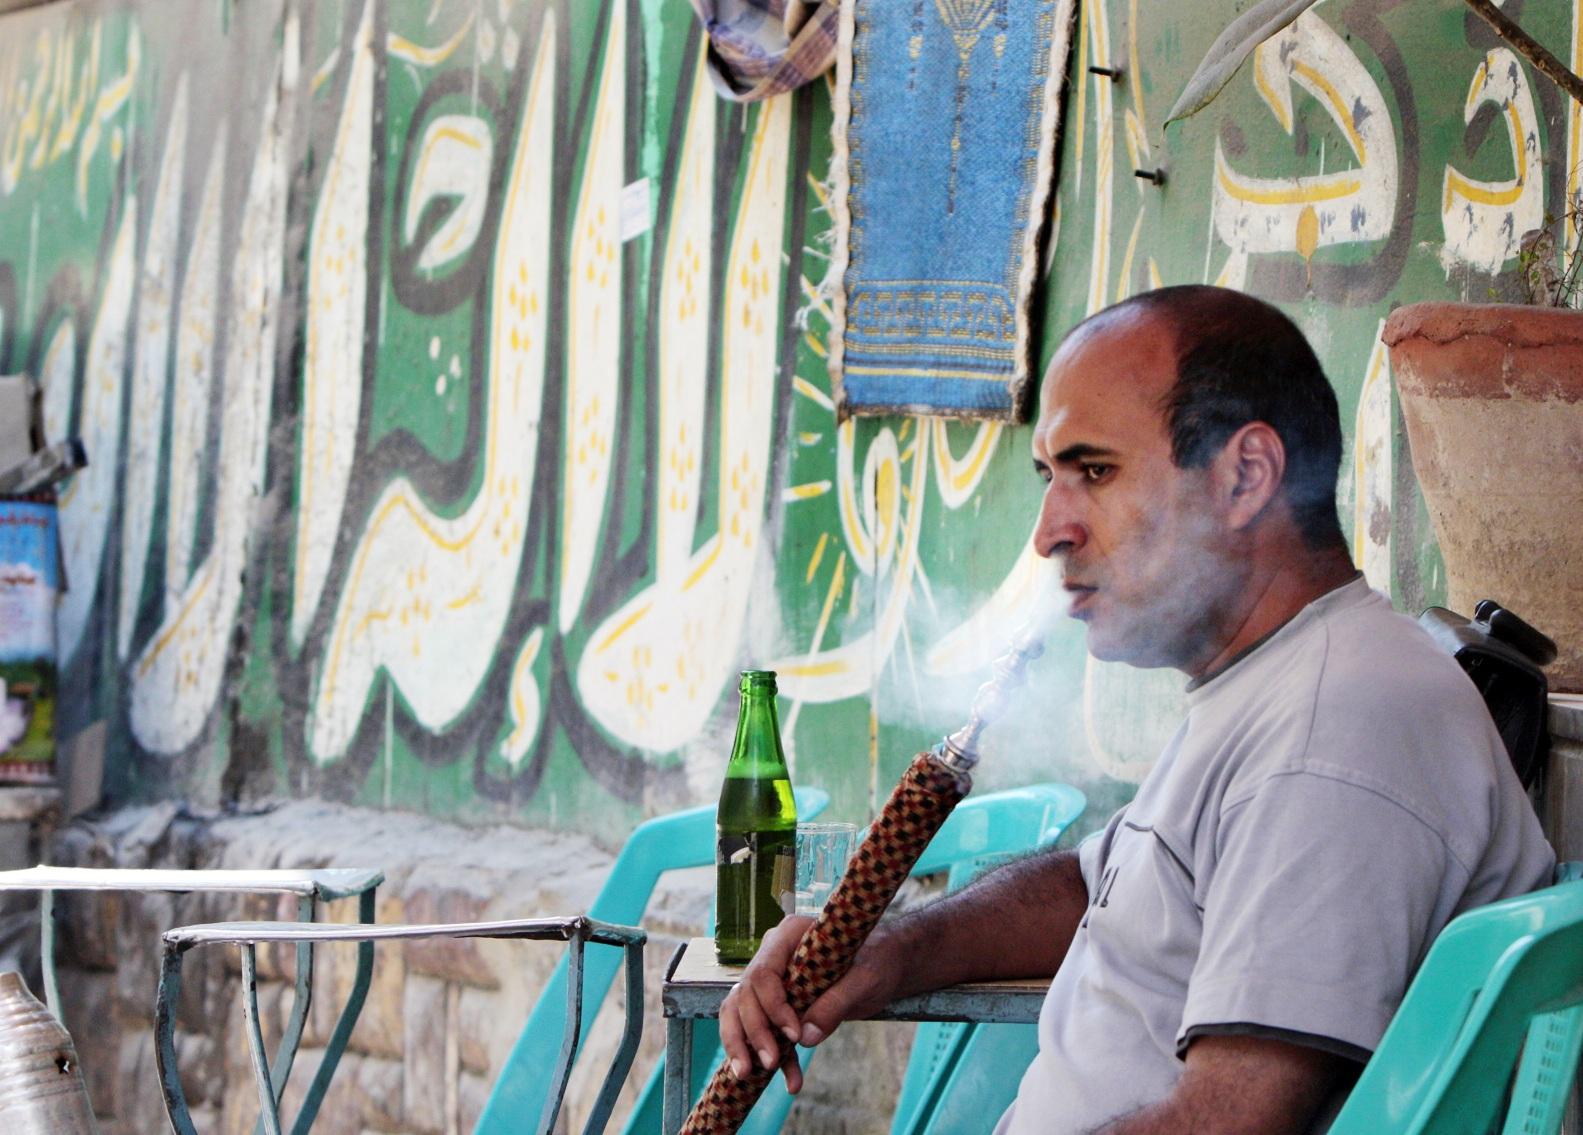 A man smoking shisha the traditional way